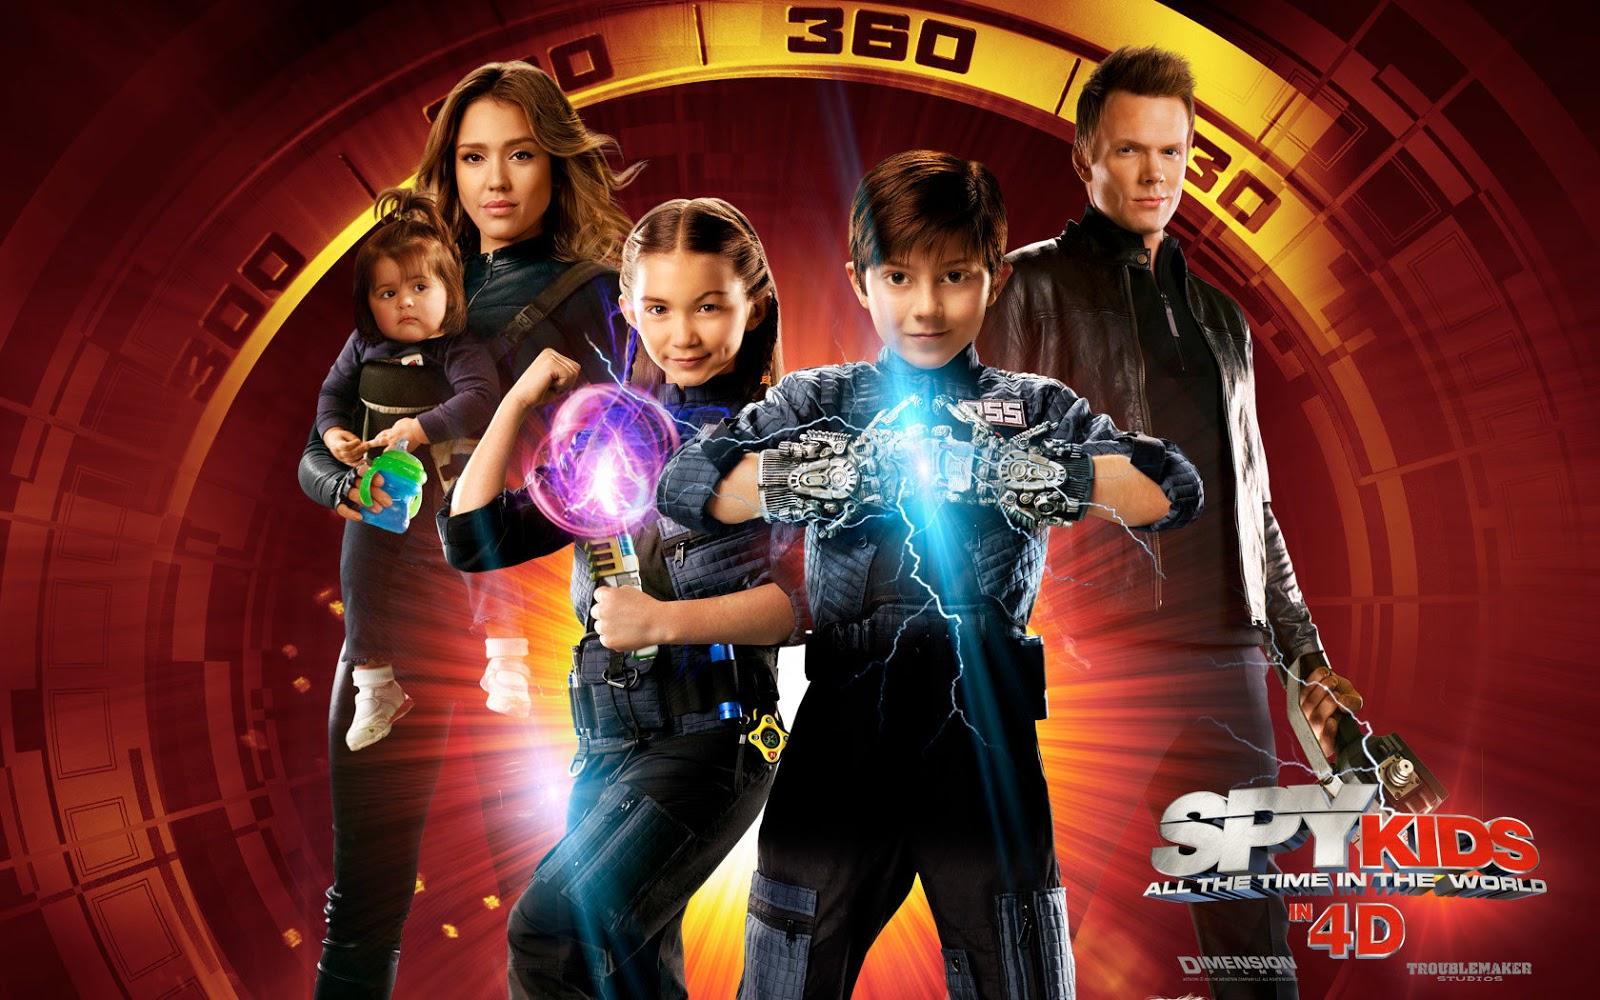 http://4.bp.blogspot.com/-iZ9gIXJDvkY/Tvbp-mOFf4I/AAAAAAAACOI/6YrGhGOvguU/s1600/Spy-Kids-4-Wallpaper-01.jpg